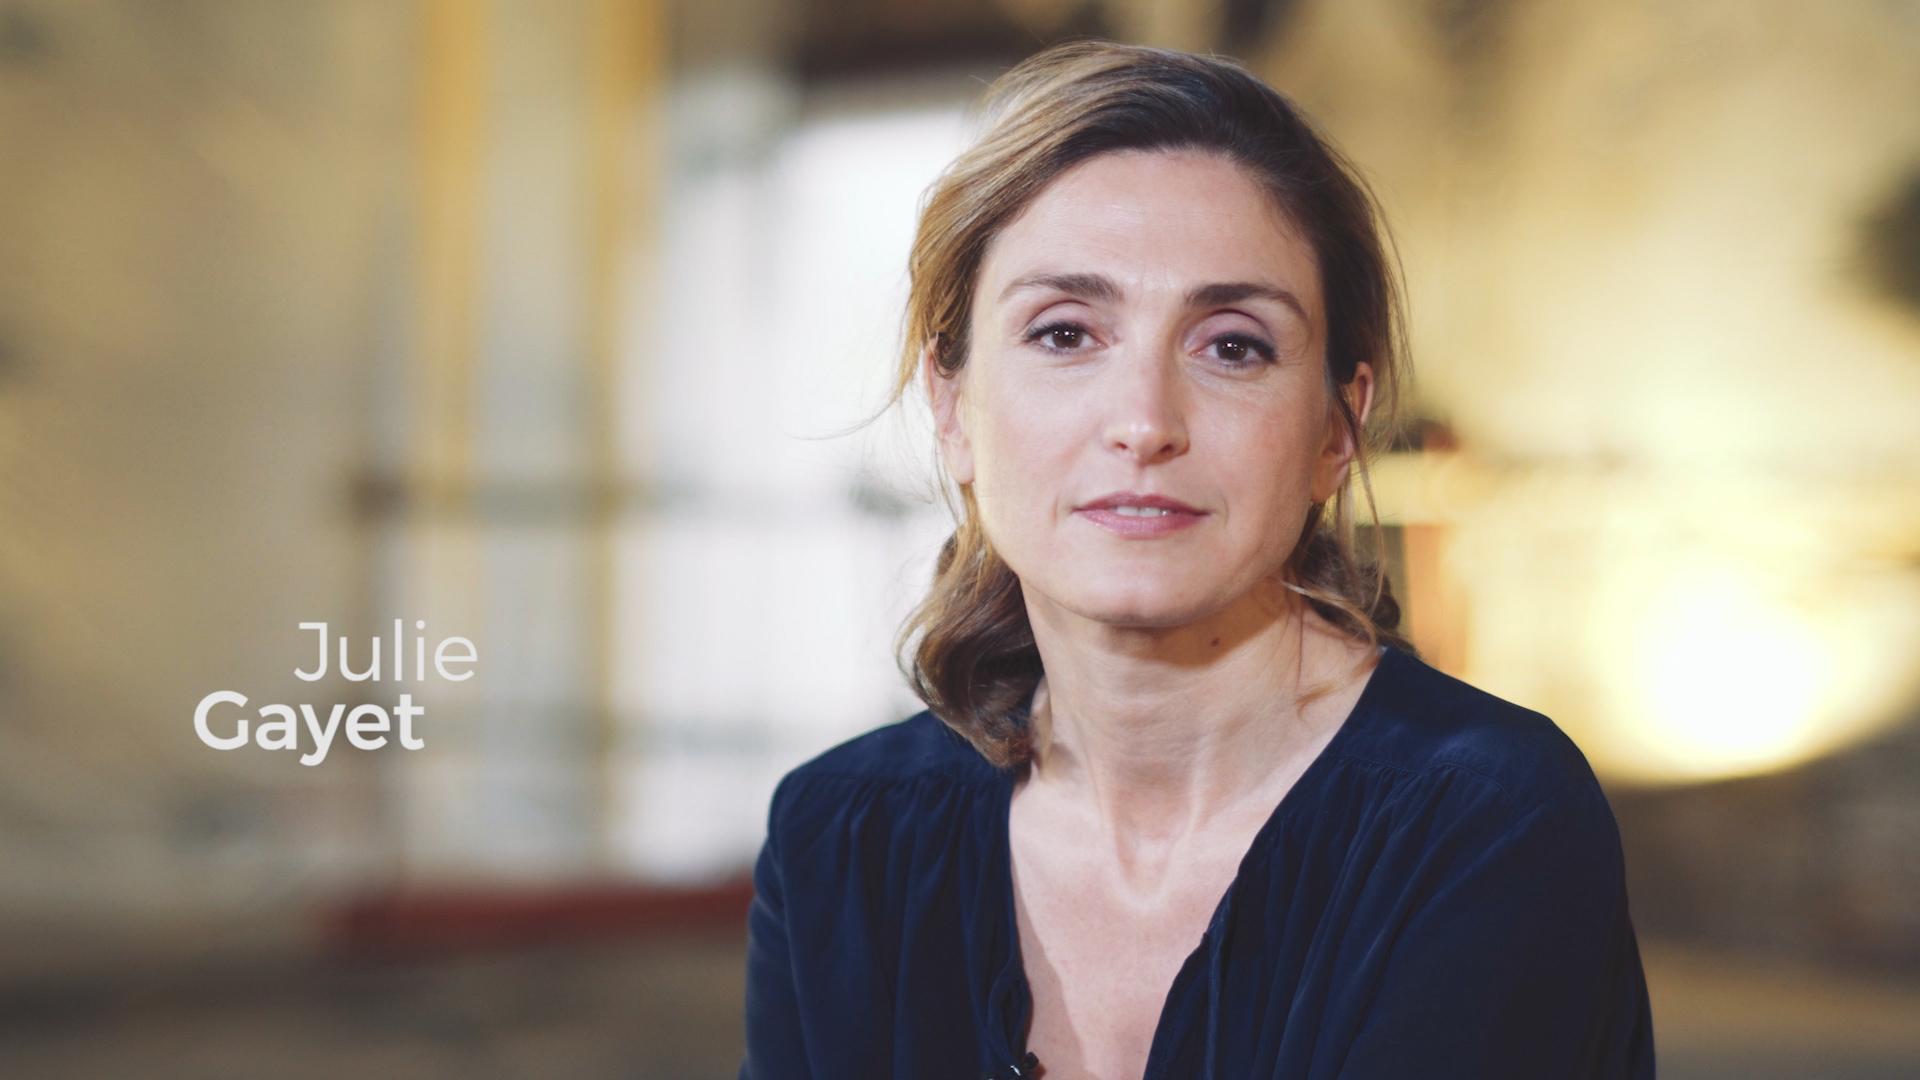 personnage de jovany 12/10/17 bravo à Martine Julie-Gayet